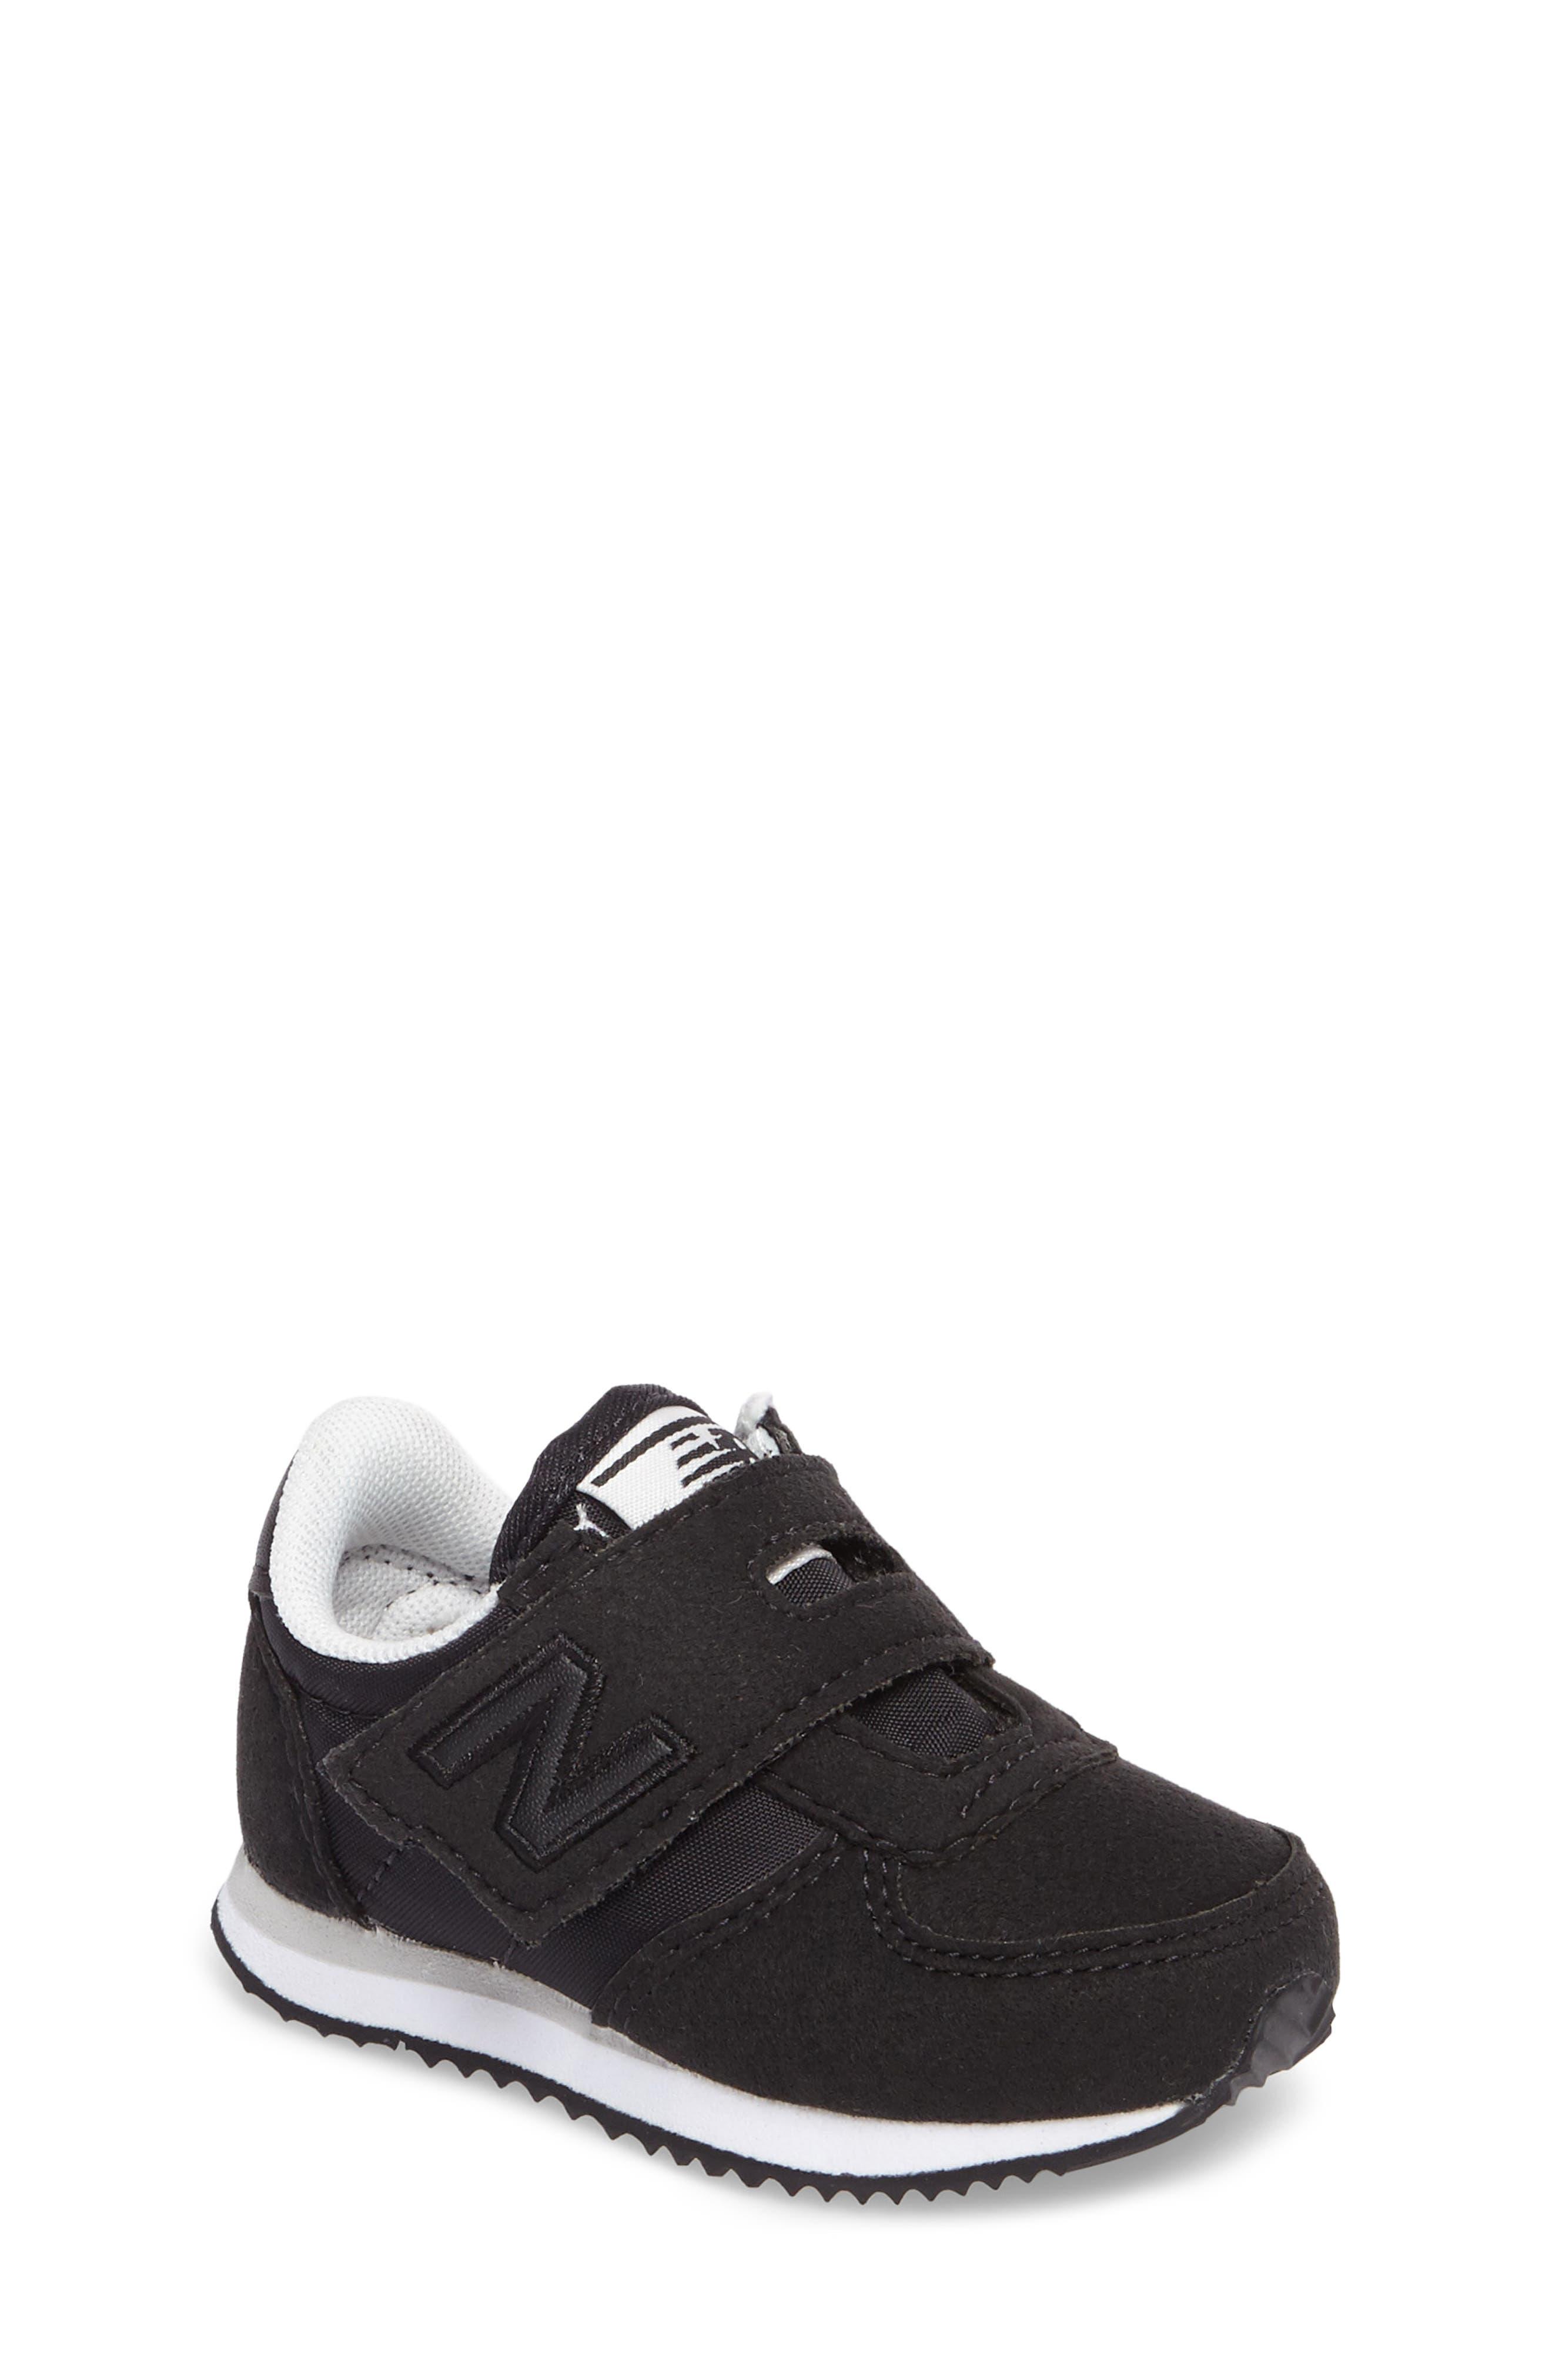 220 Hook and Loop Sneaker,                             Main thumbnail 1, color,                             Black